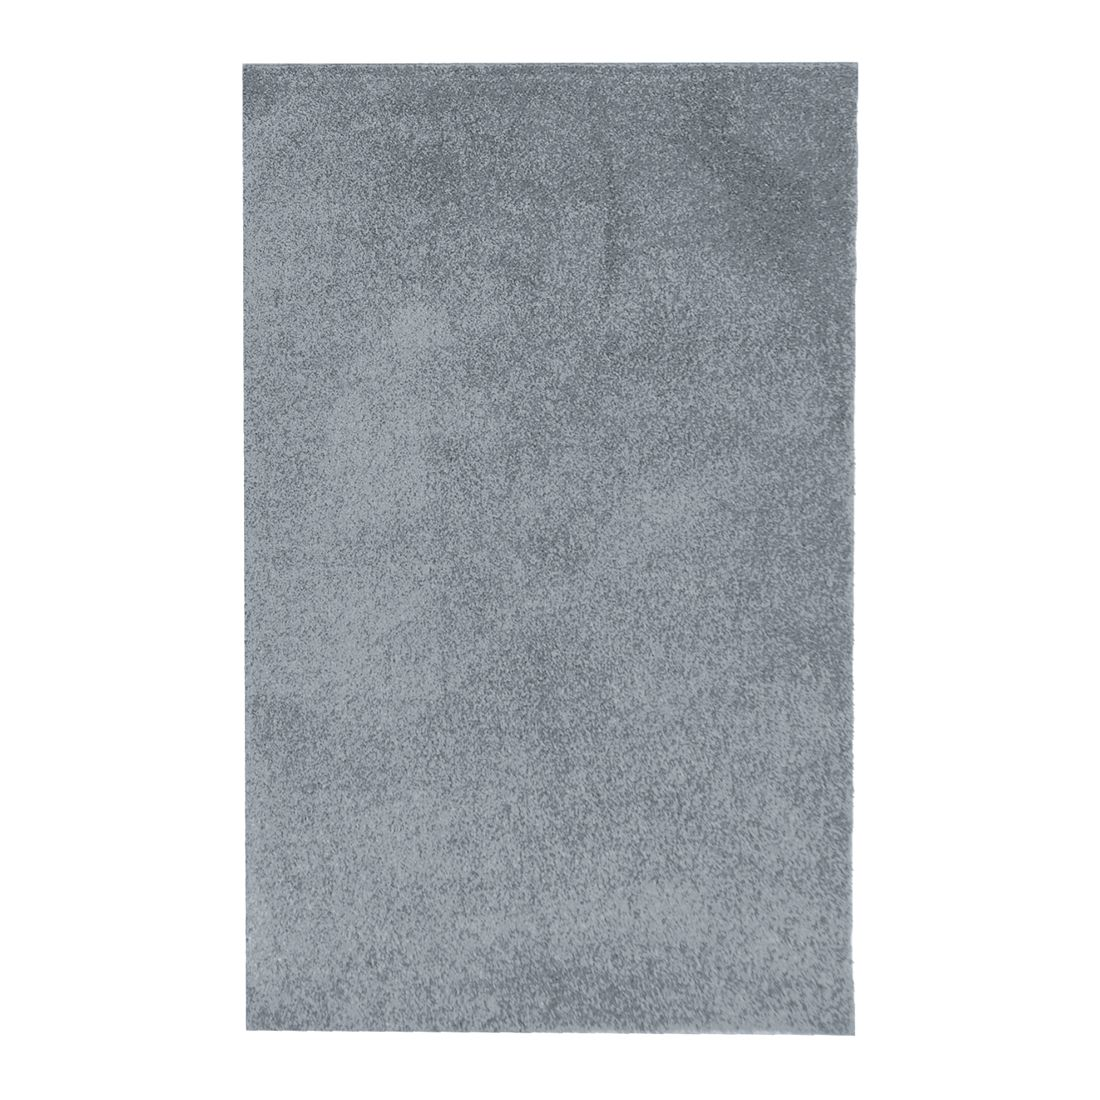 shaggy teppich preis vergleich 2016. Black Bedroom Furniture Sets. Home Design Ideas